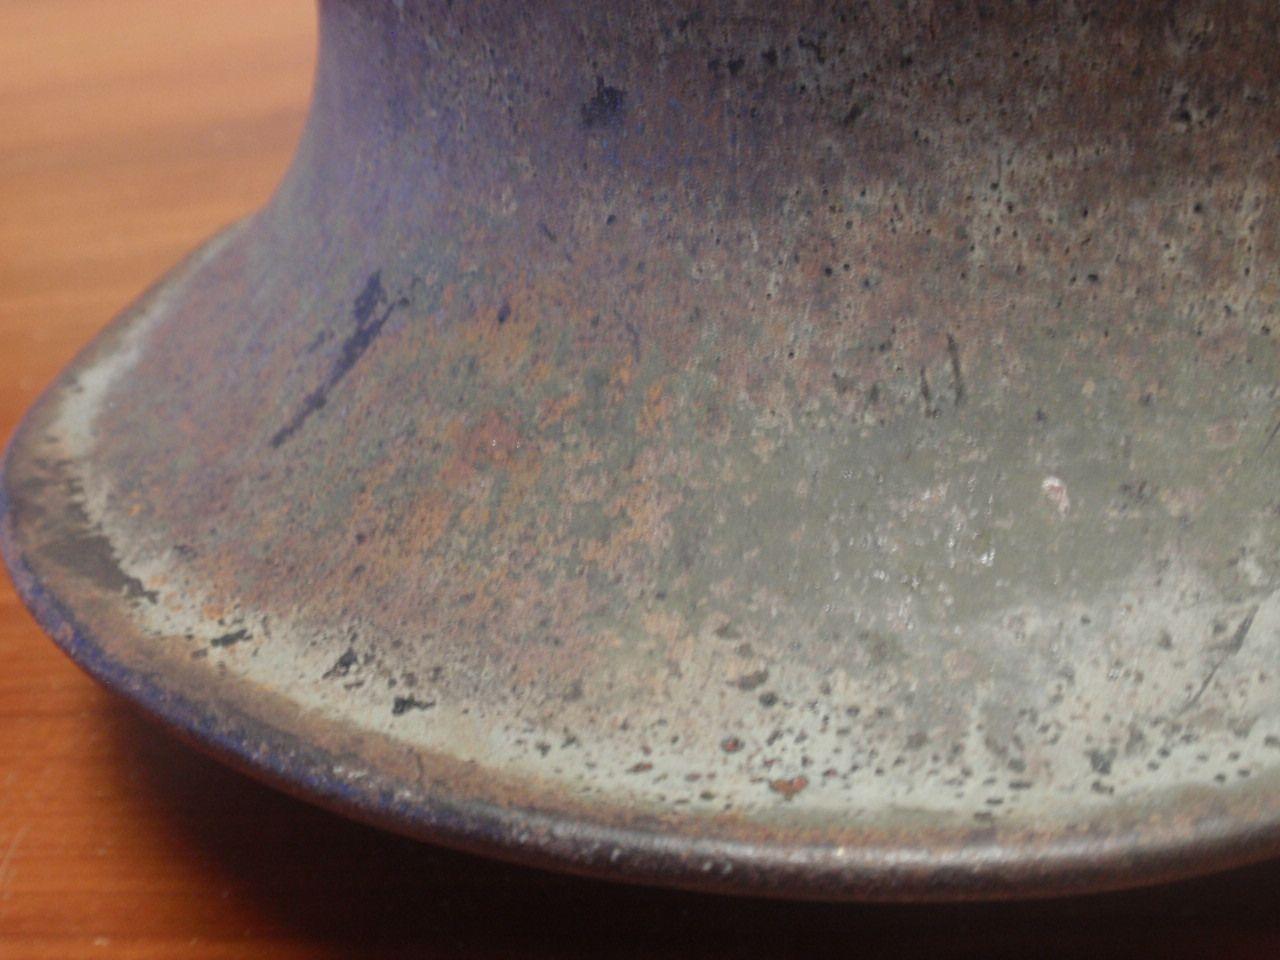 Time Traveler Militaria - WW1 German Helmet | UniformRef